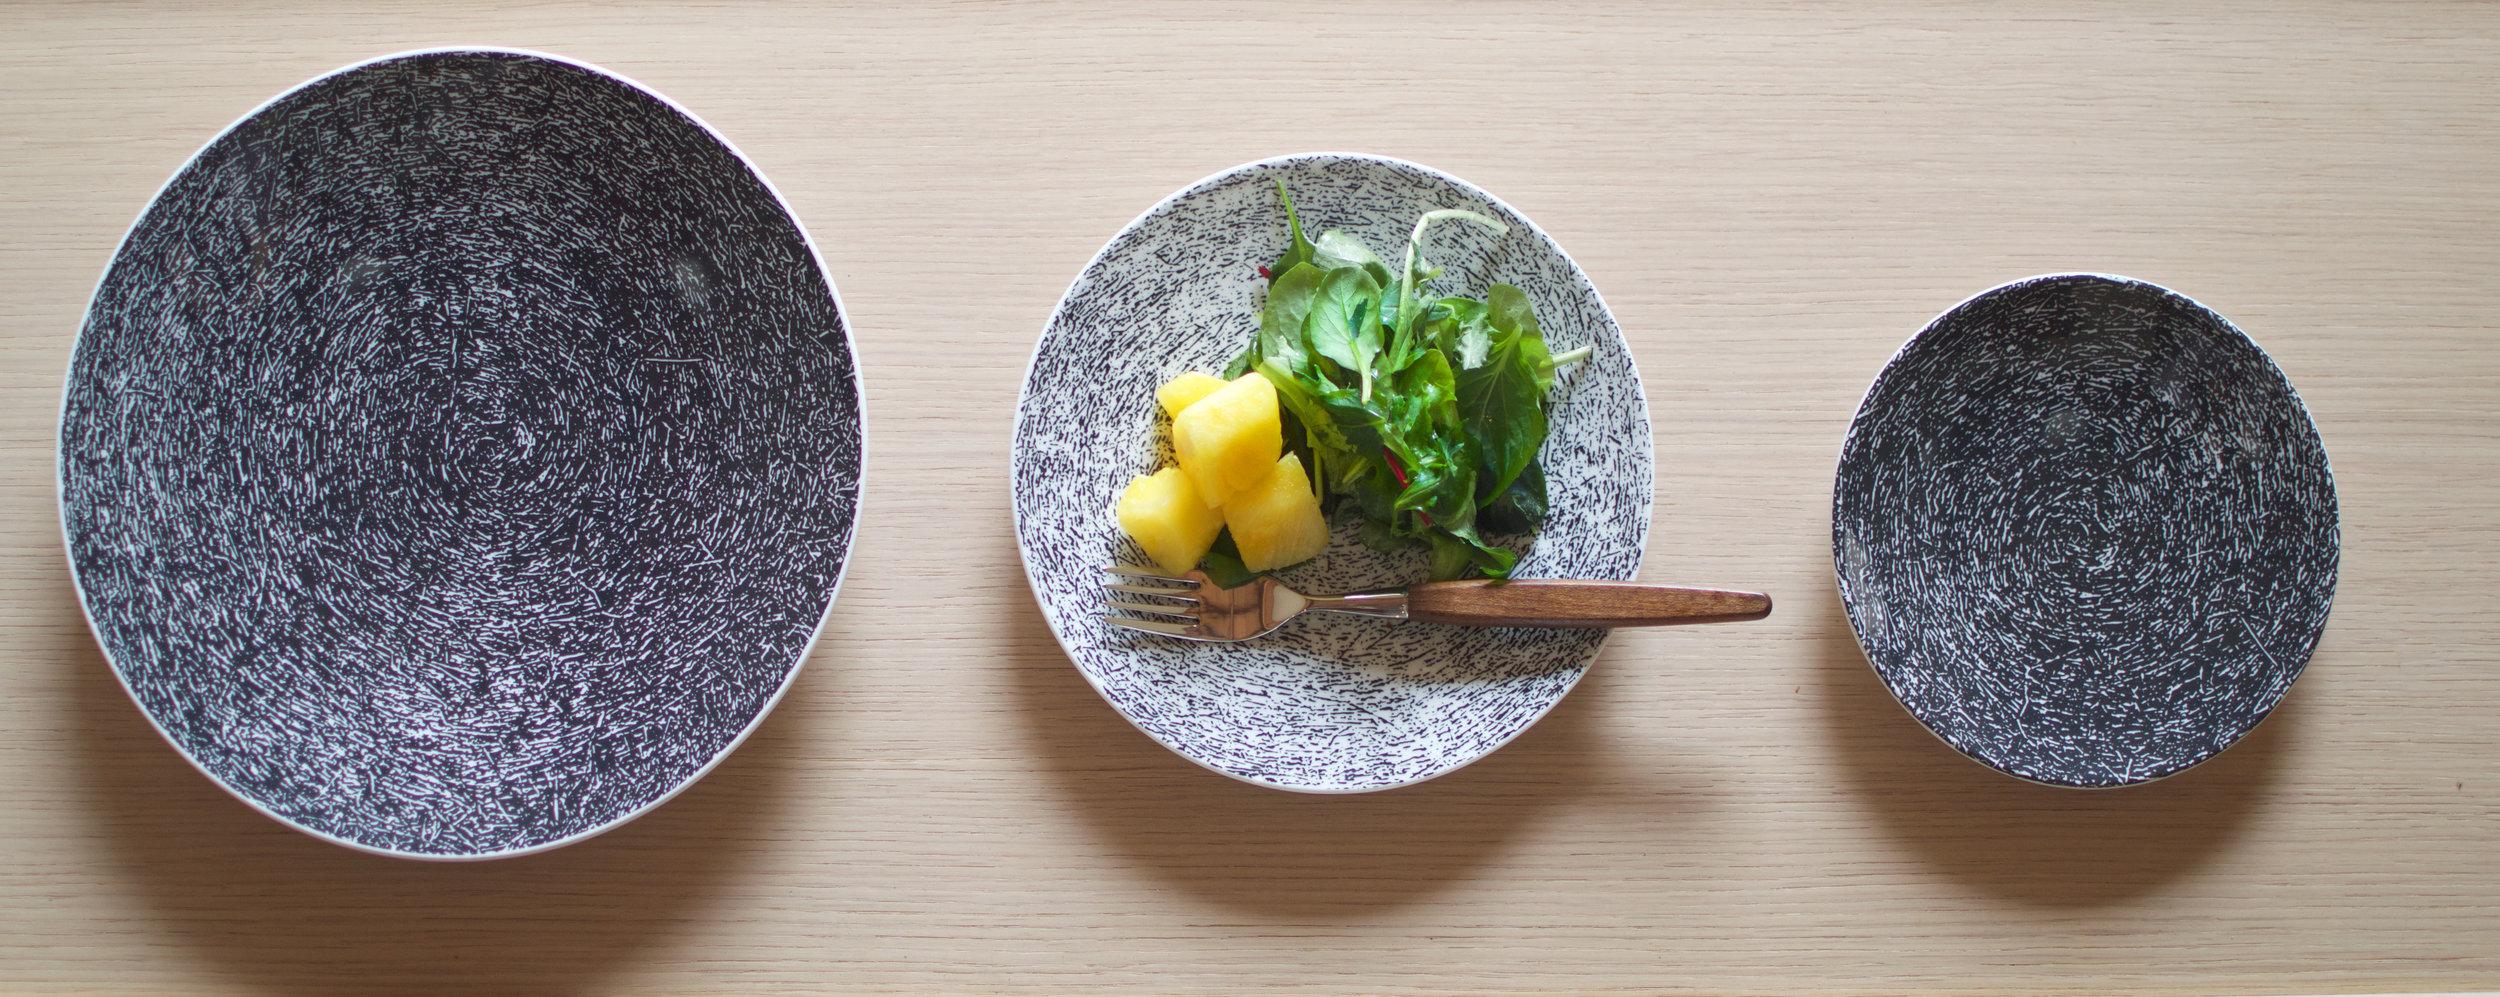 Gras-21food.jpg